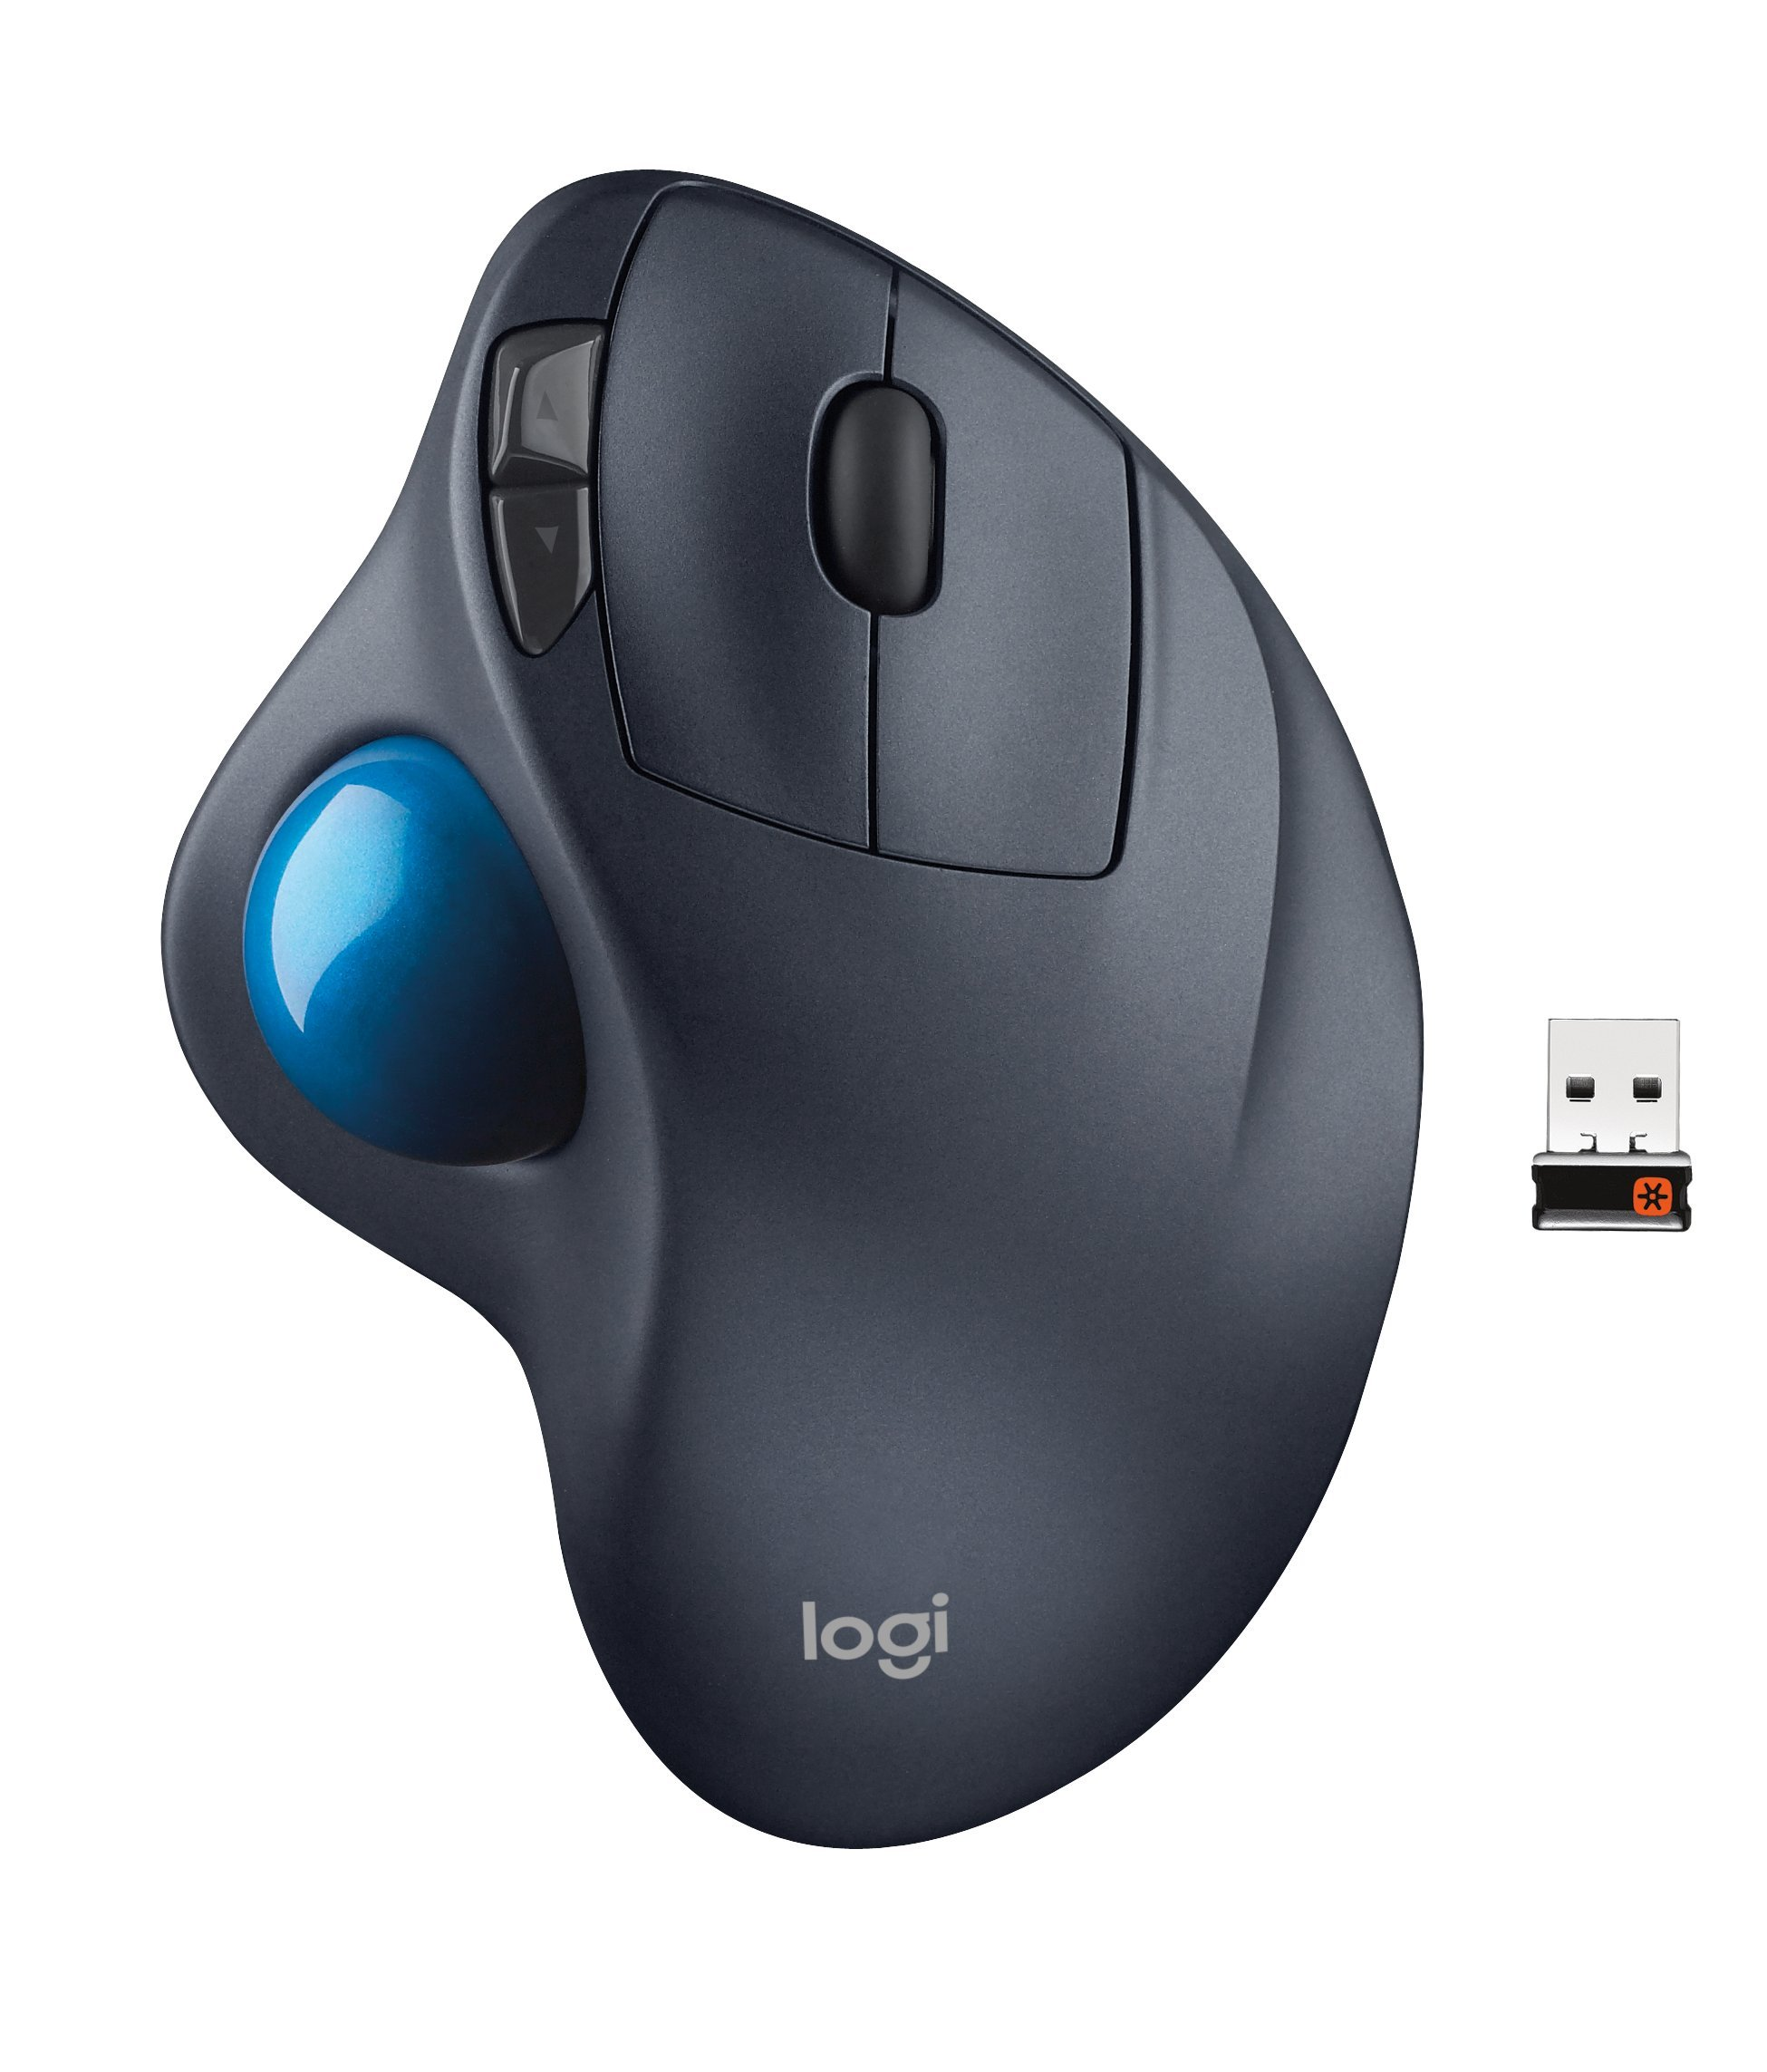 Logitech Wireless Trackball M570 by Logitech